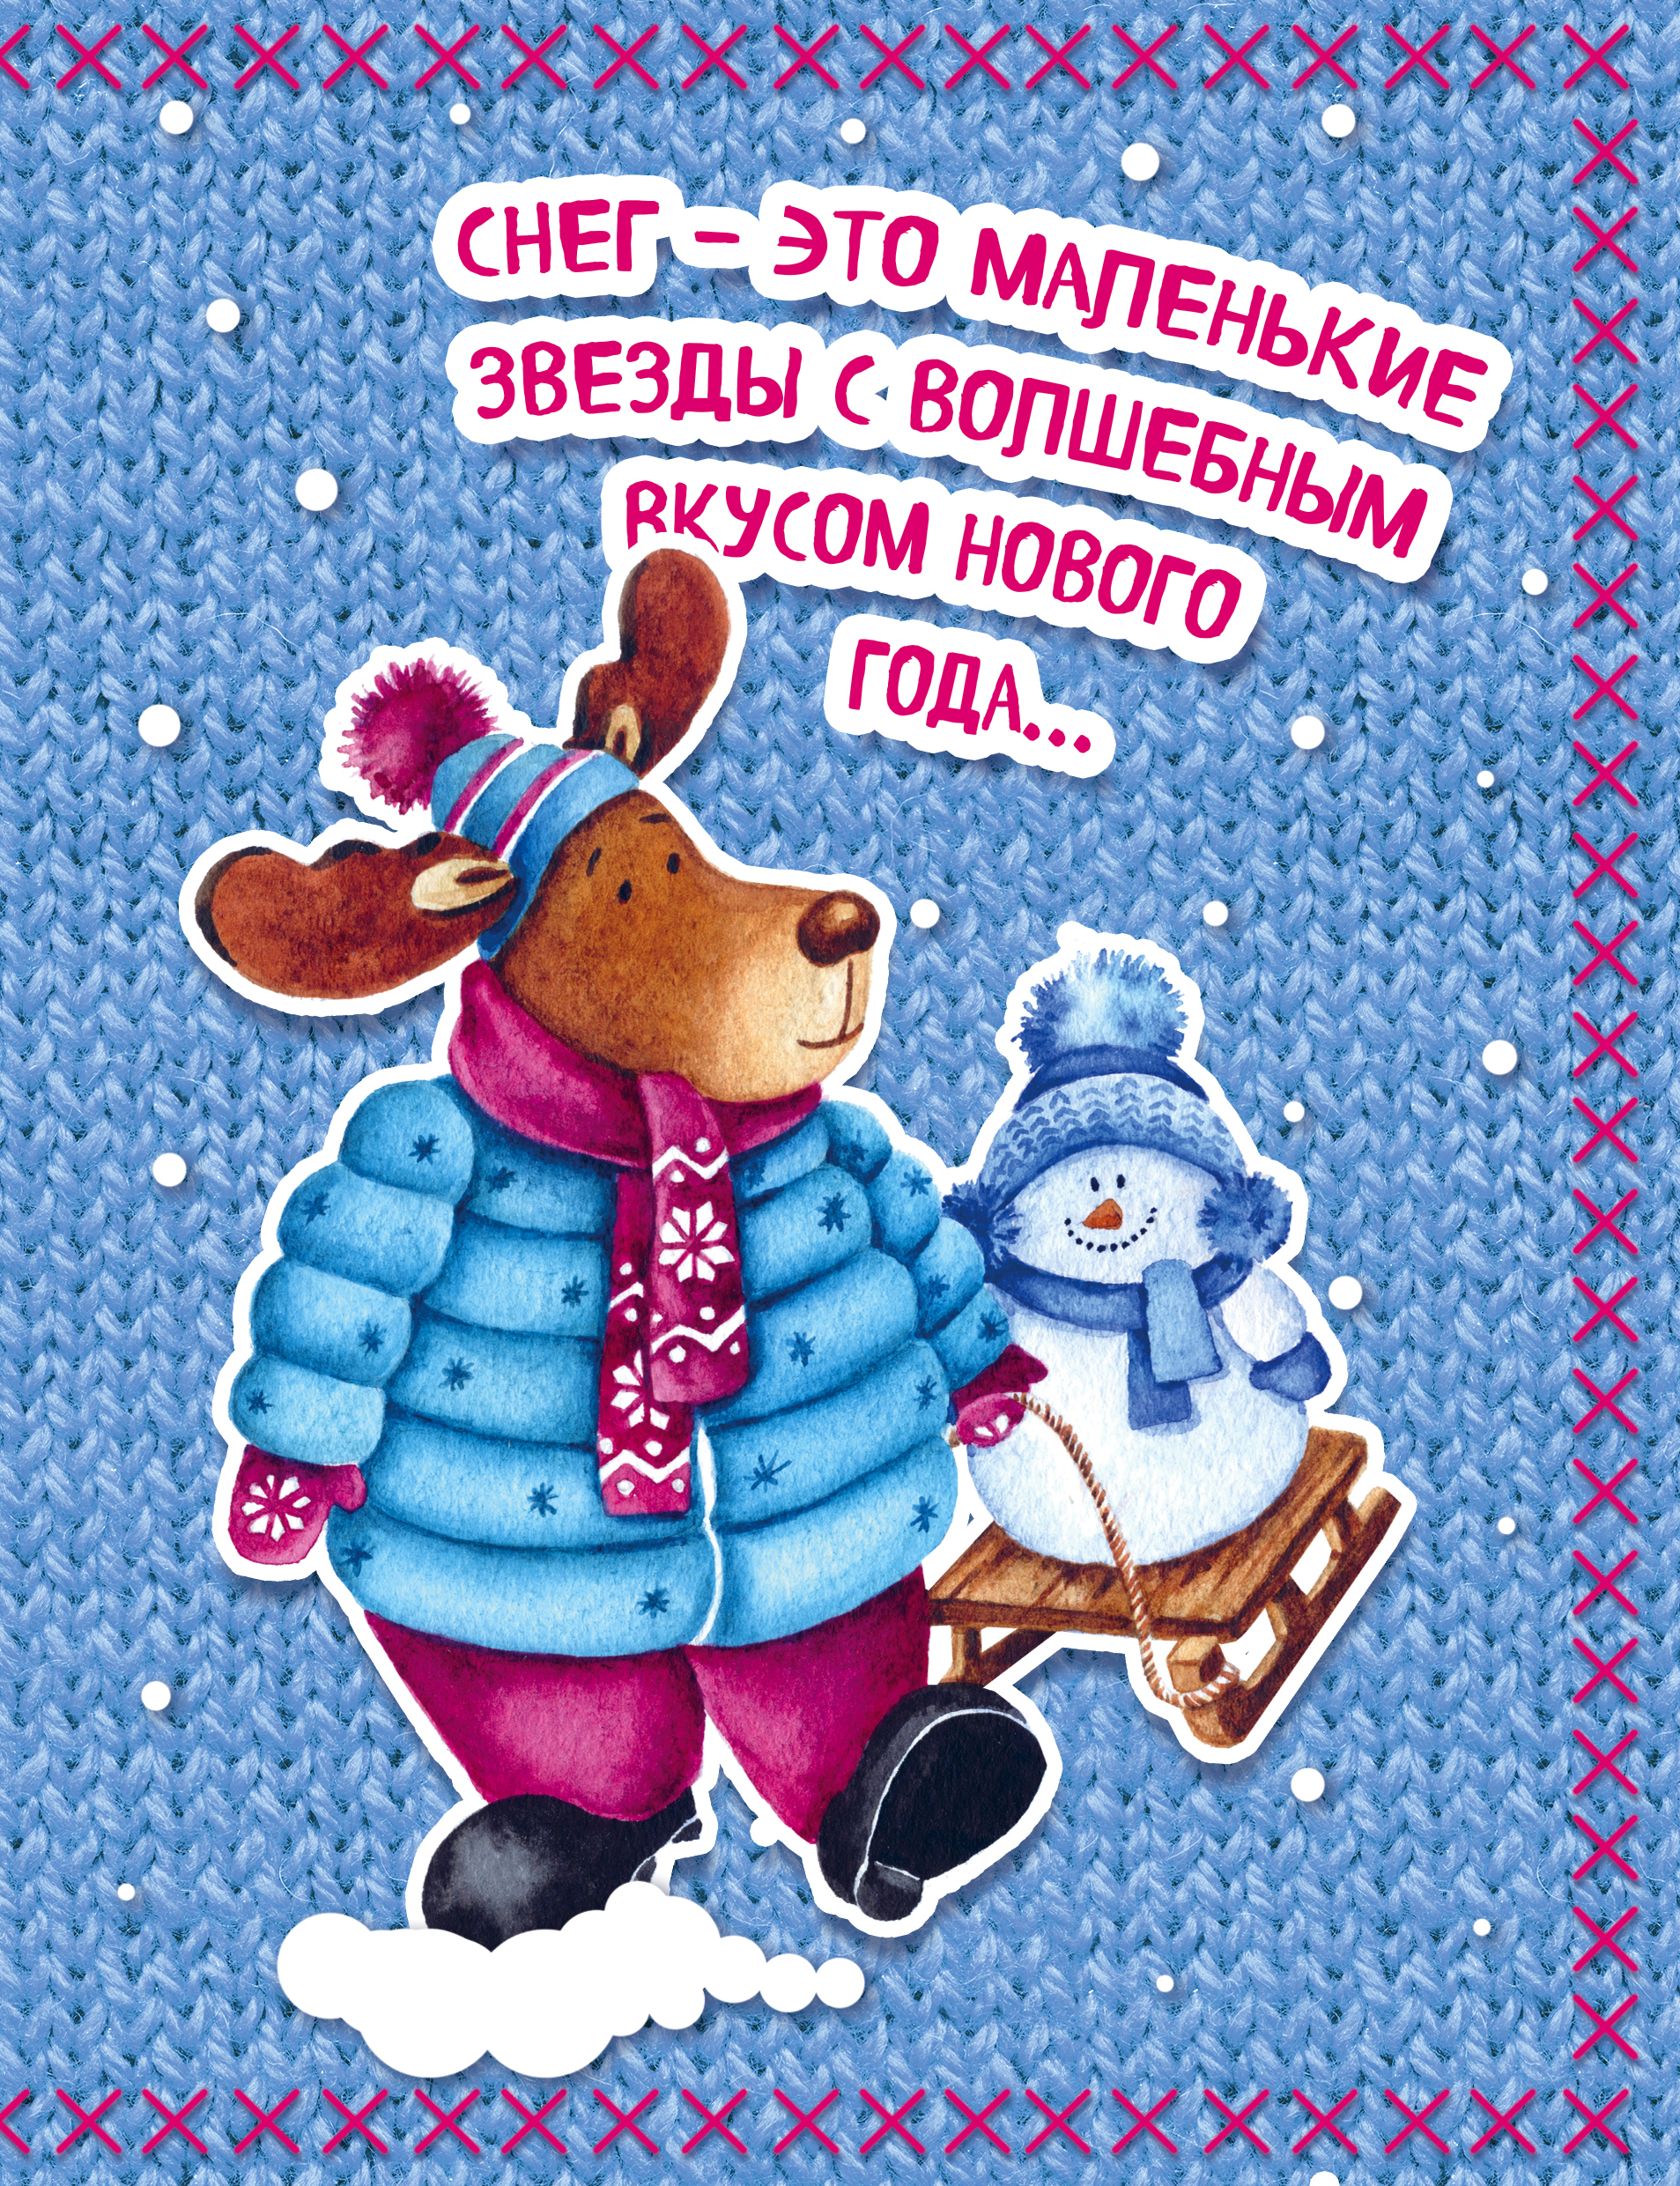 Елизавета Мякишева Блокнот. Новогодние олени (Одевайся теплее!) блокнот не трогай мой блокнот а5 144 стр